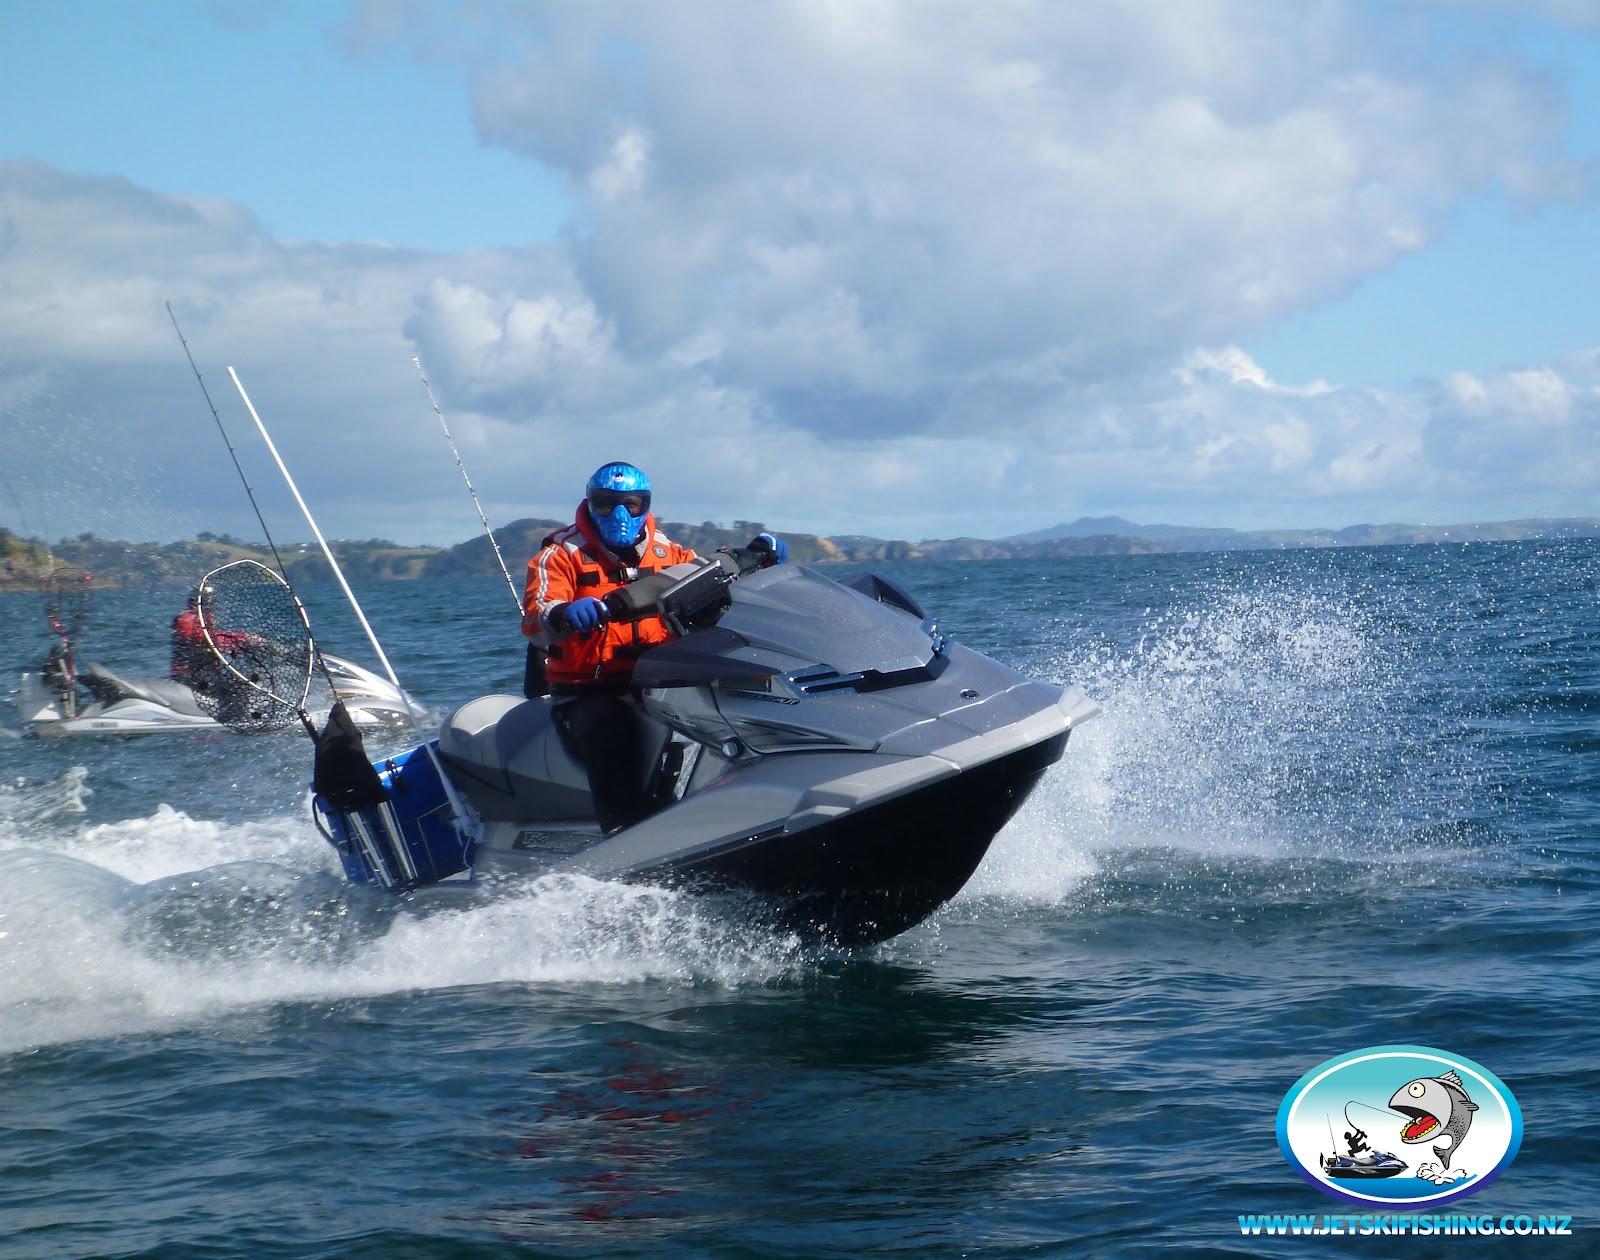 Jet ski fishing blog august 2012 for Fishing jet ski